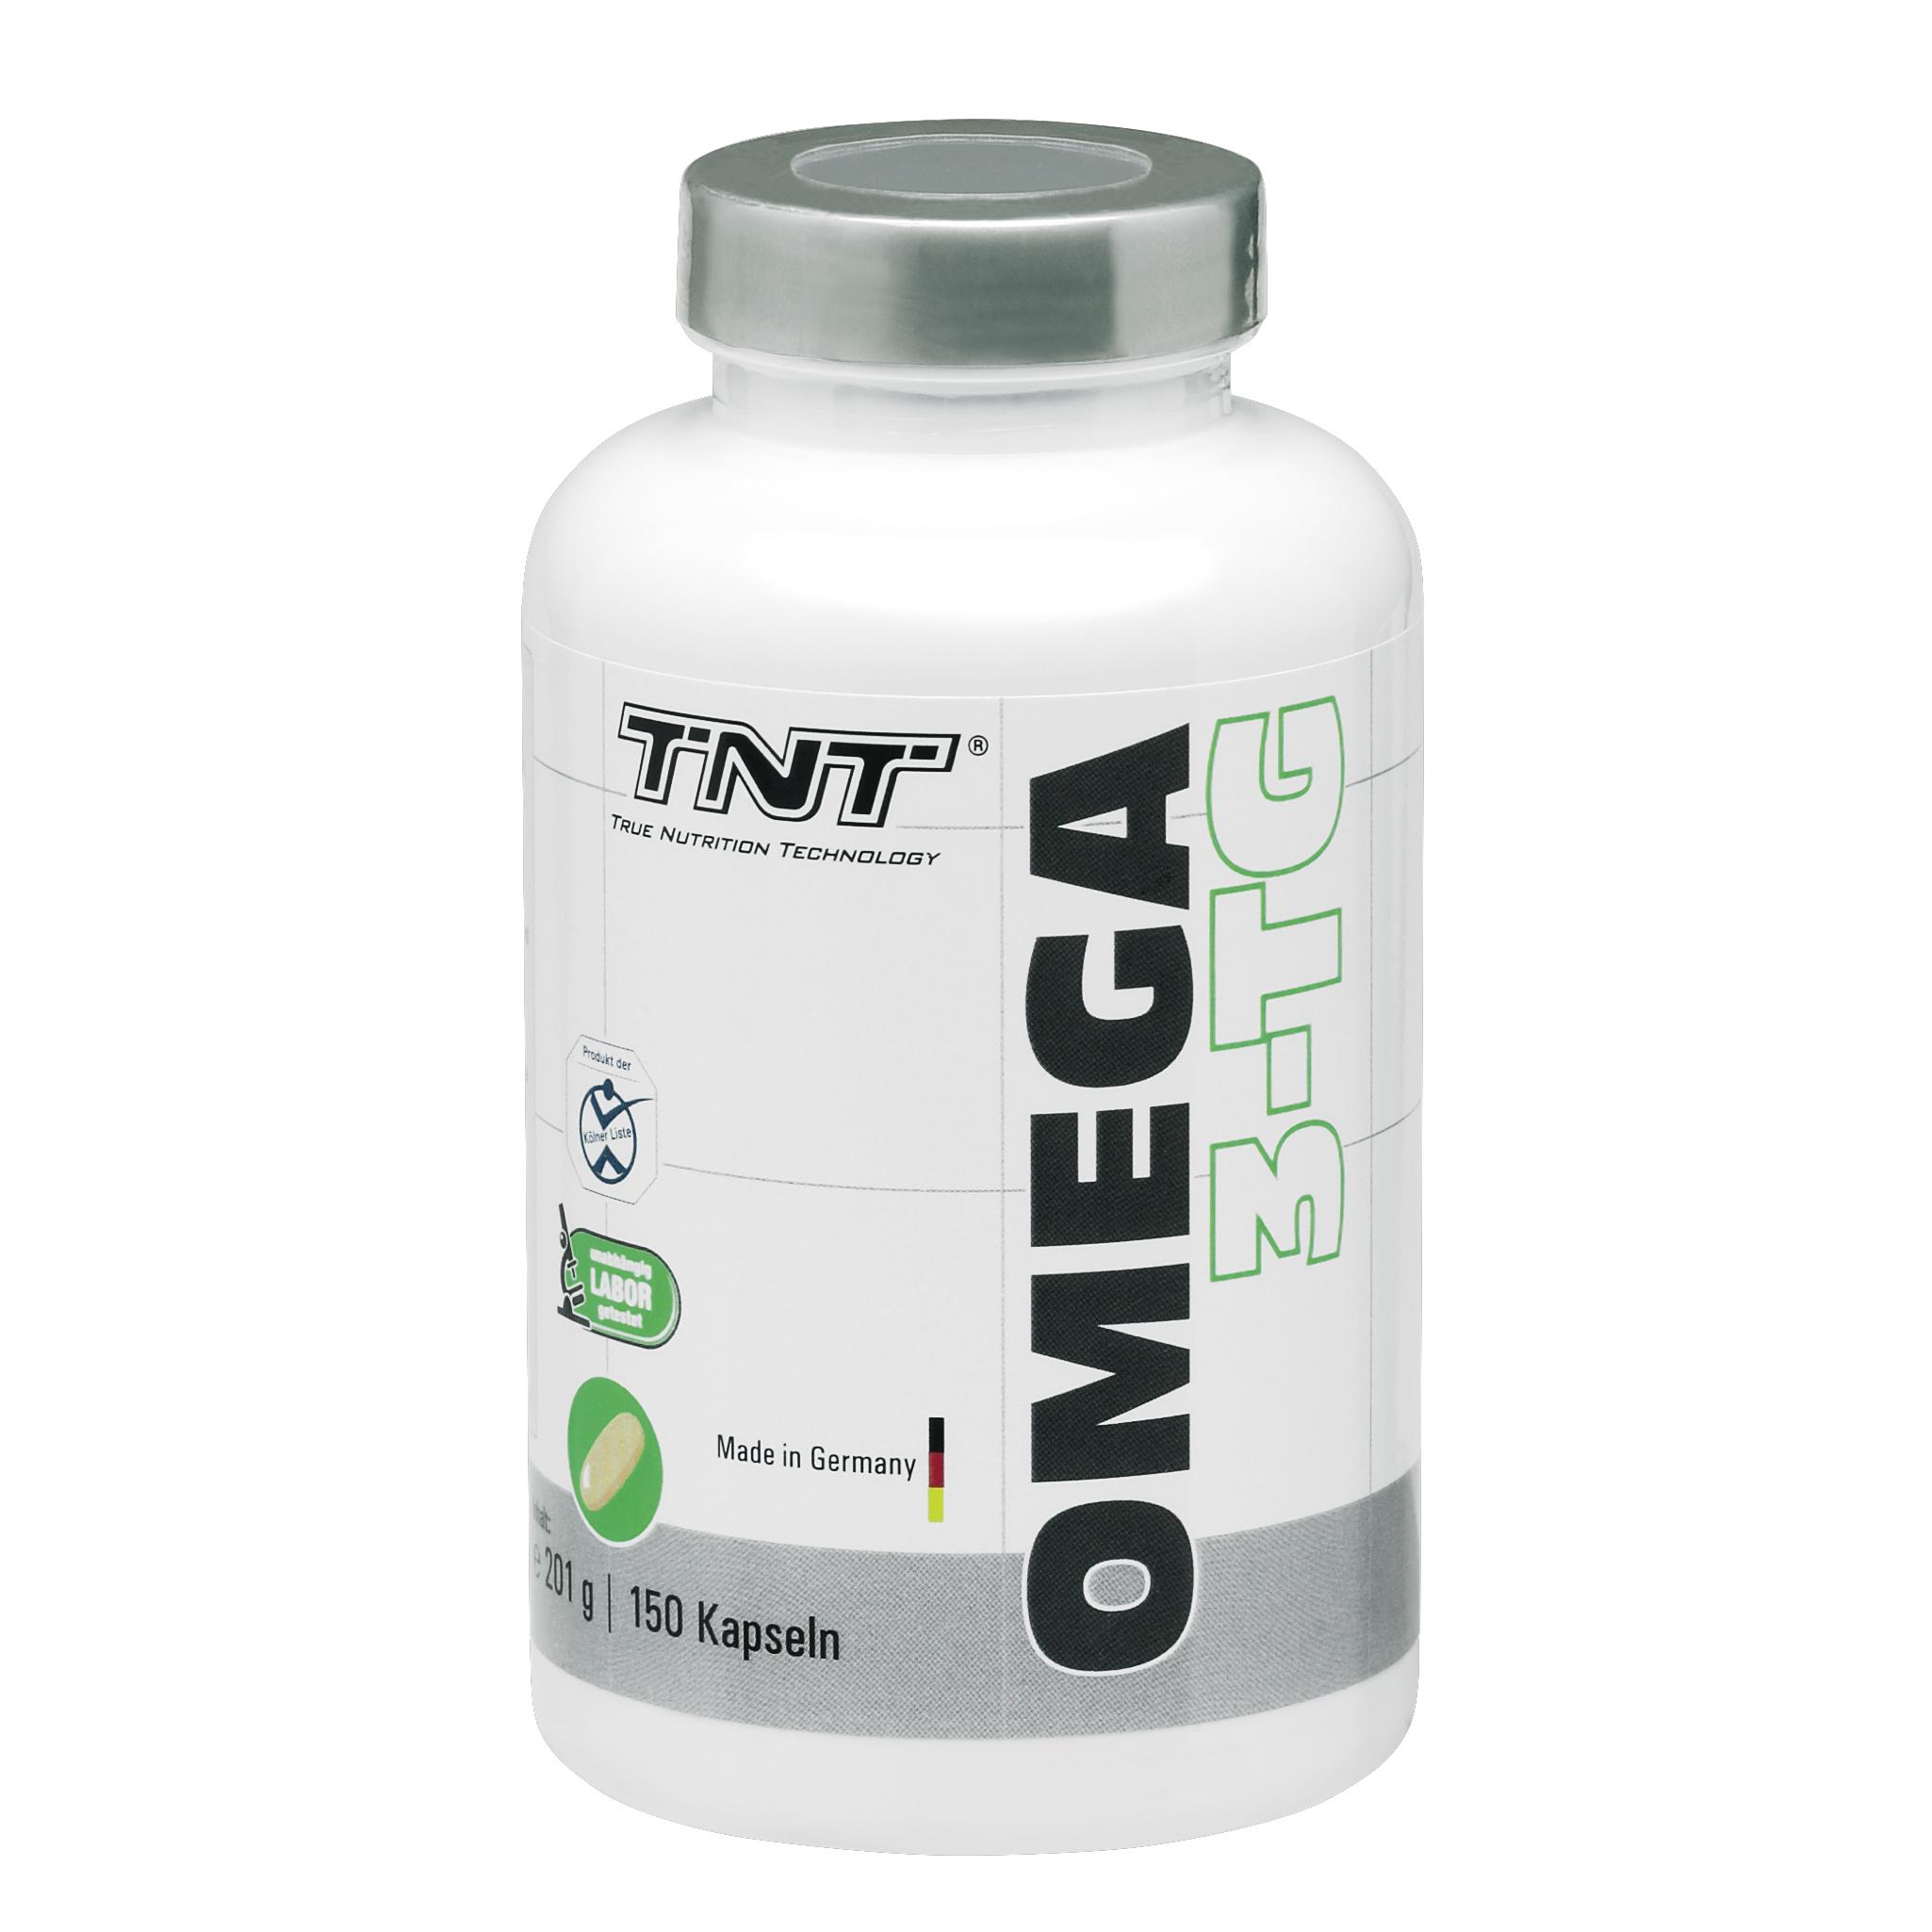 TNT Omega 3-TG kaufen bei Mic's Body Shop